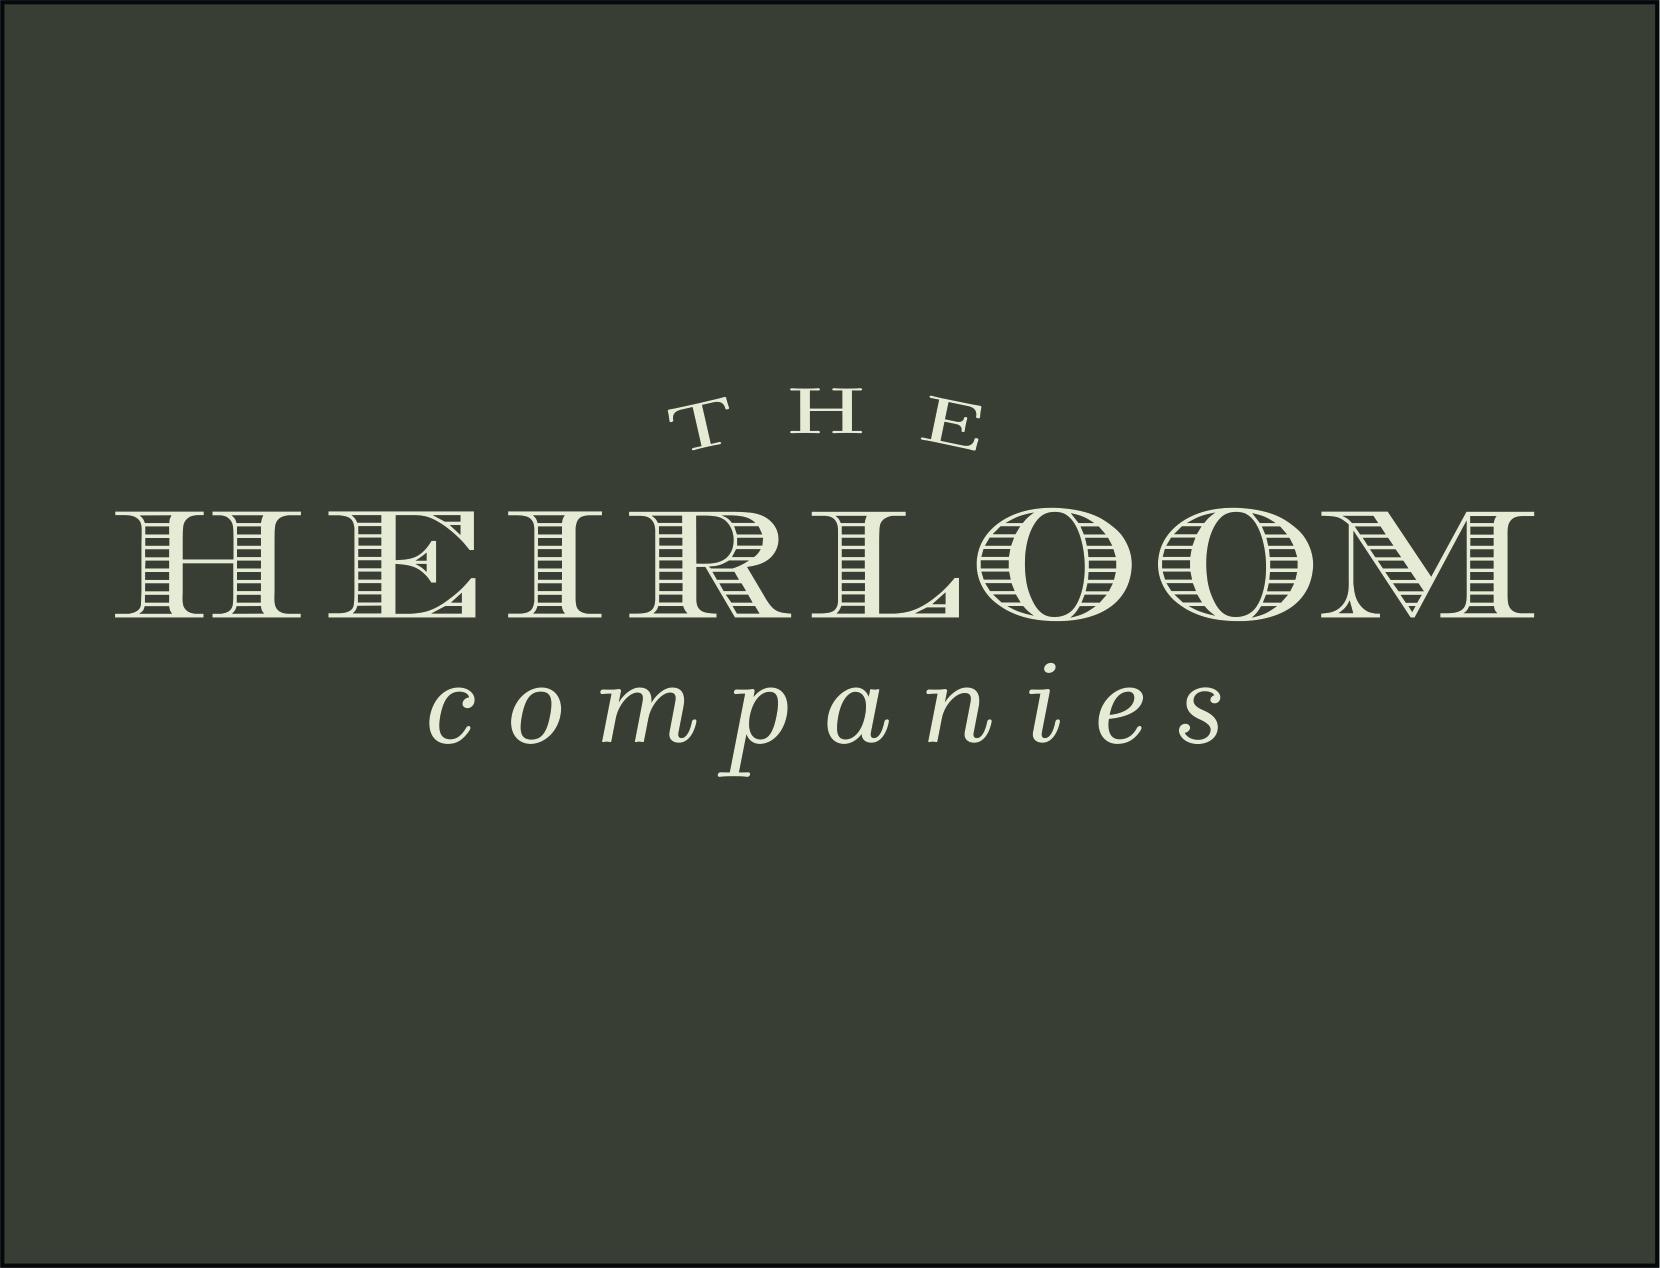 Heirloom companies Logo.jpg